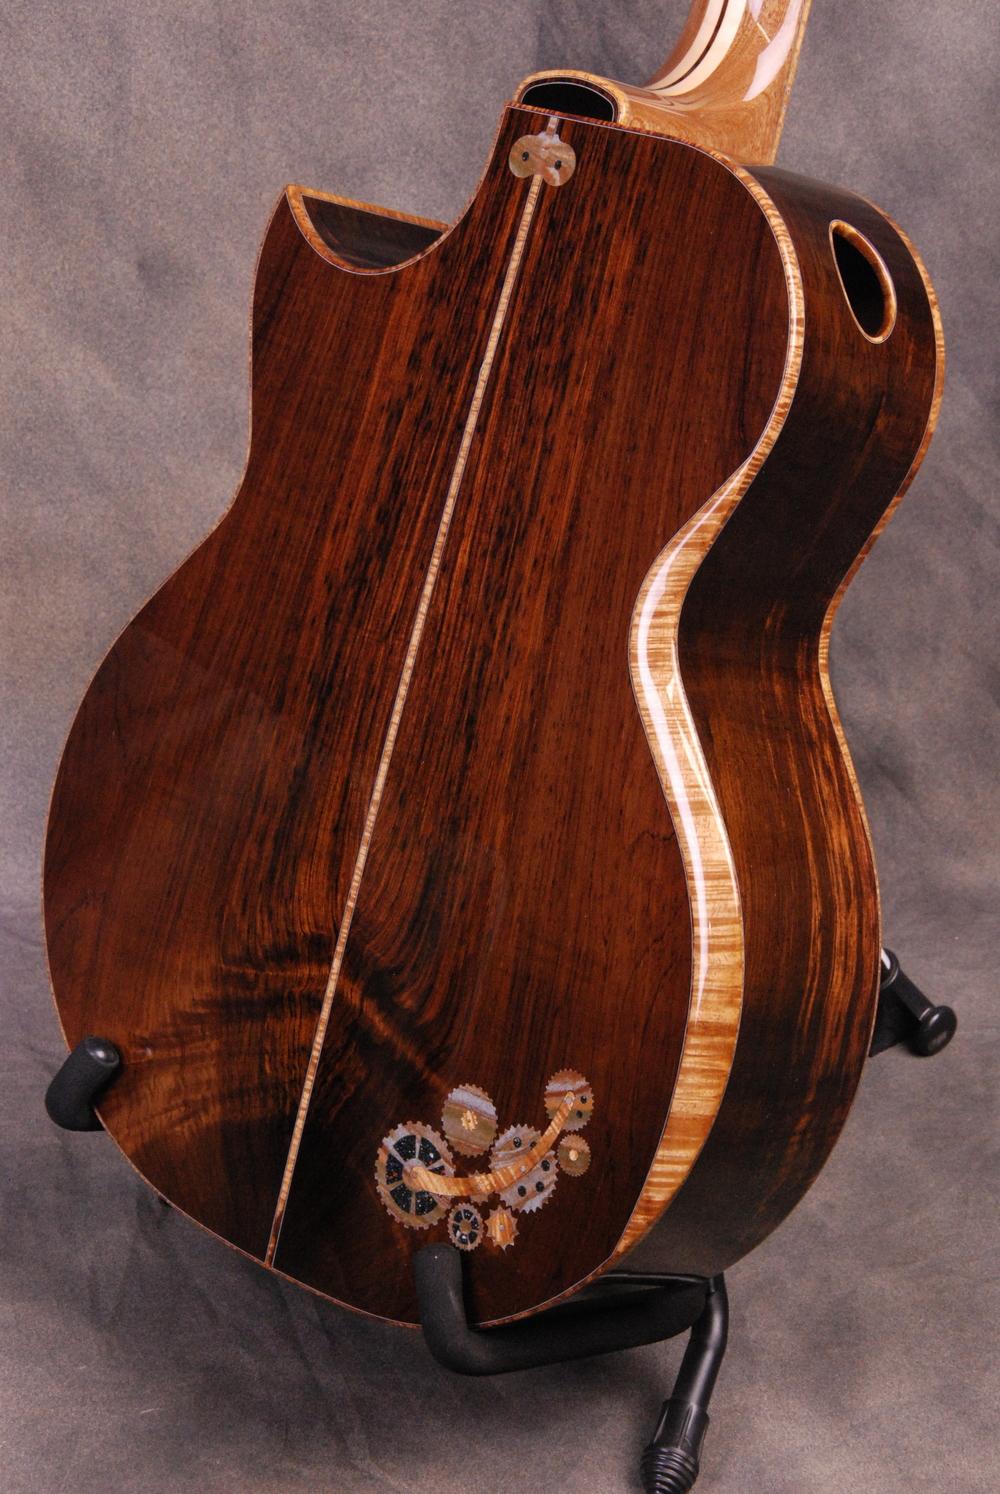 S/N 400 - Brazilian Rosewood Back & Sides, Interior Cedar Top